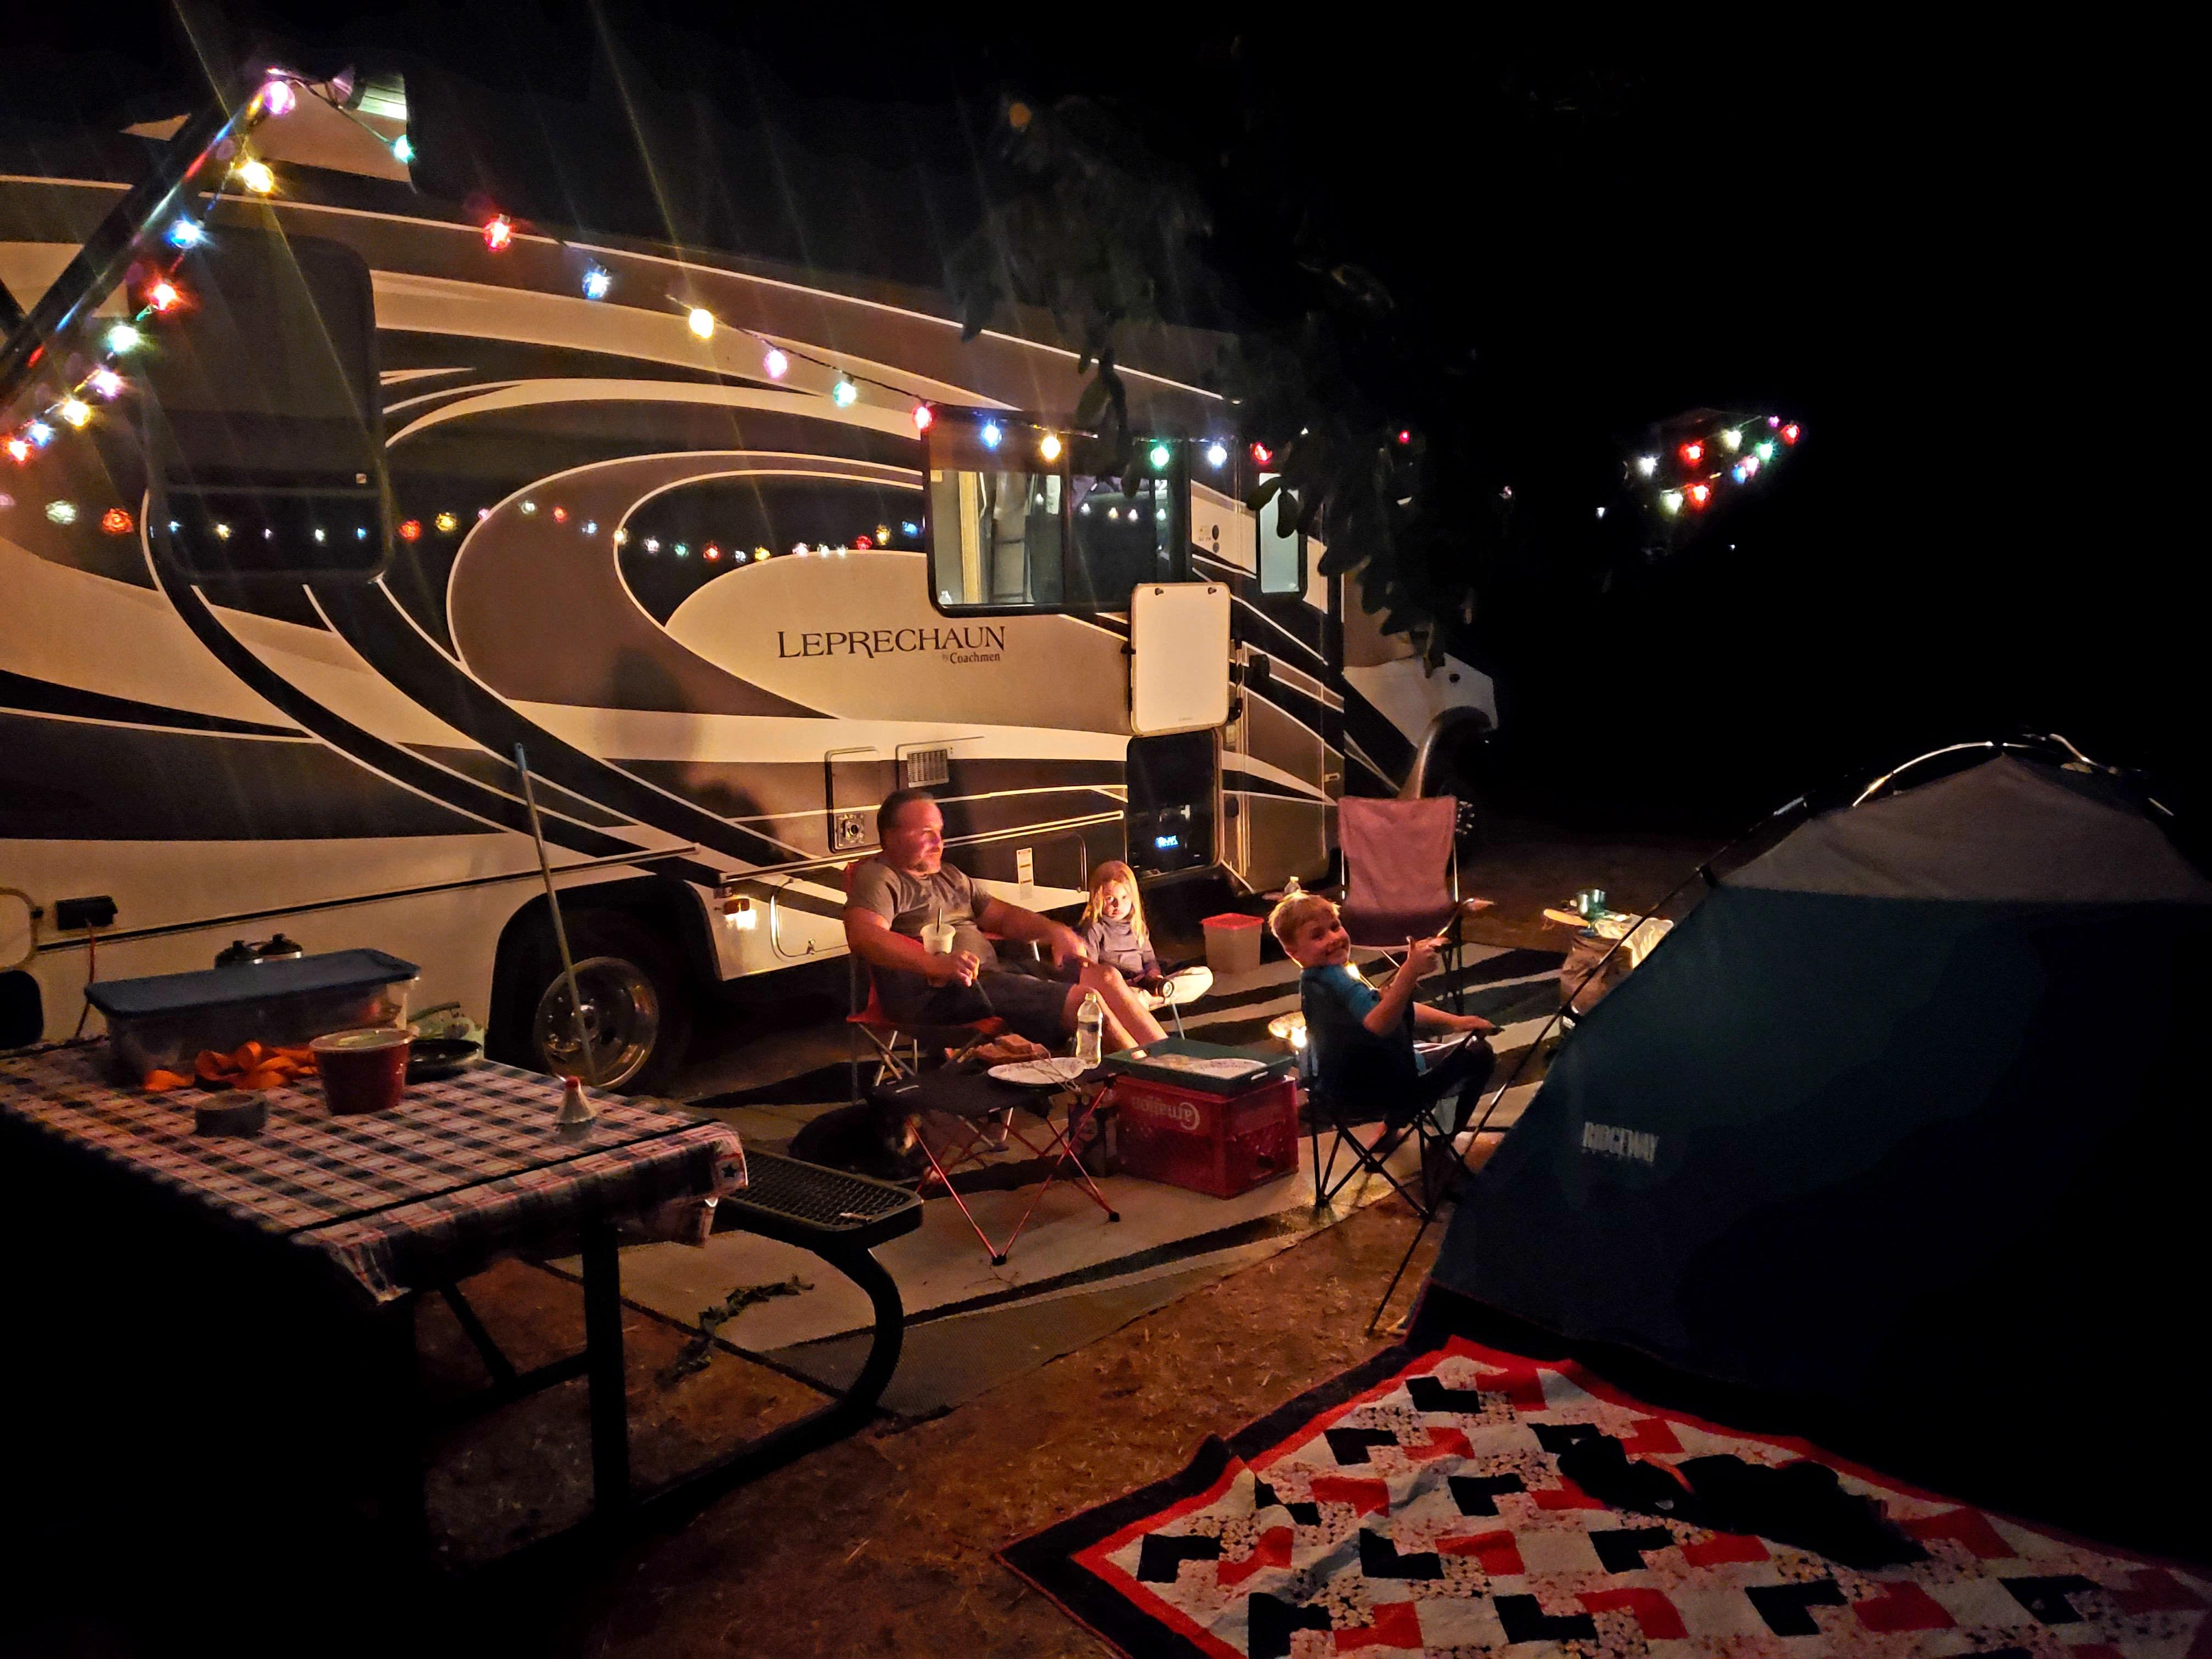 Lights provided for outdoor entertainment. Coachmen Leprechaun 2018